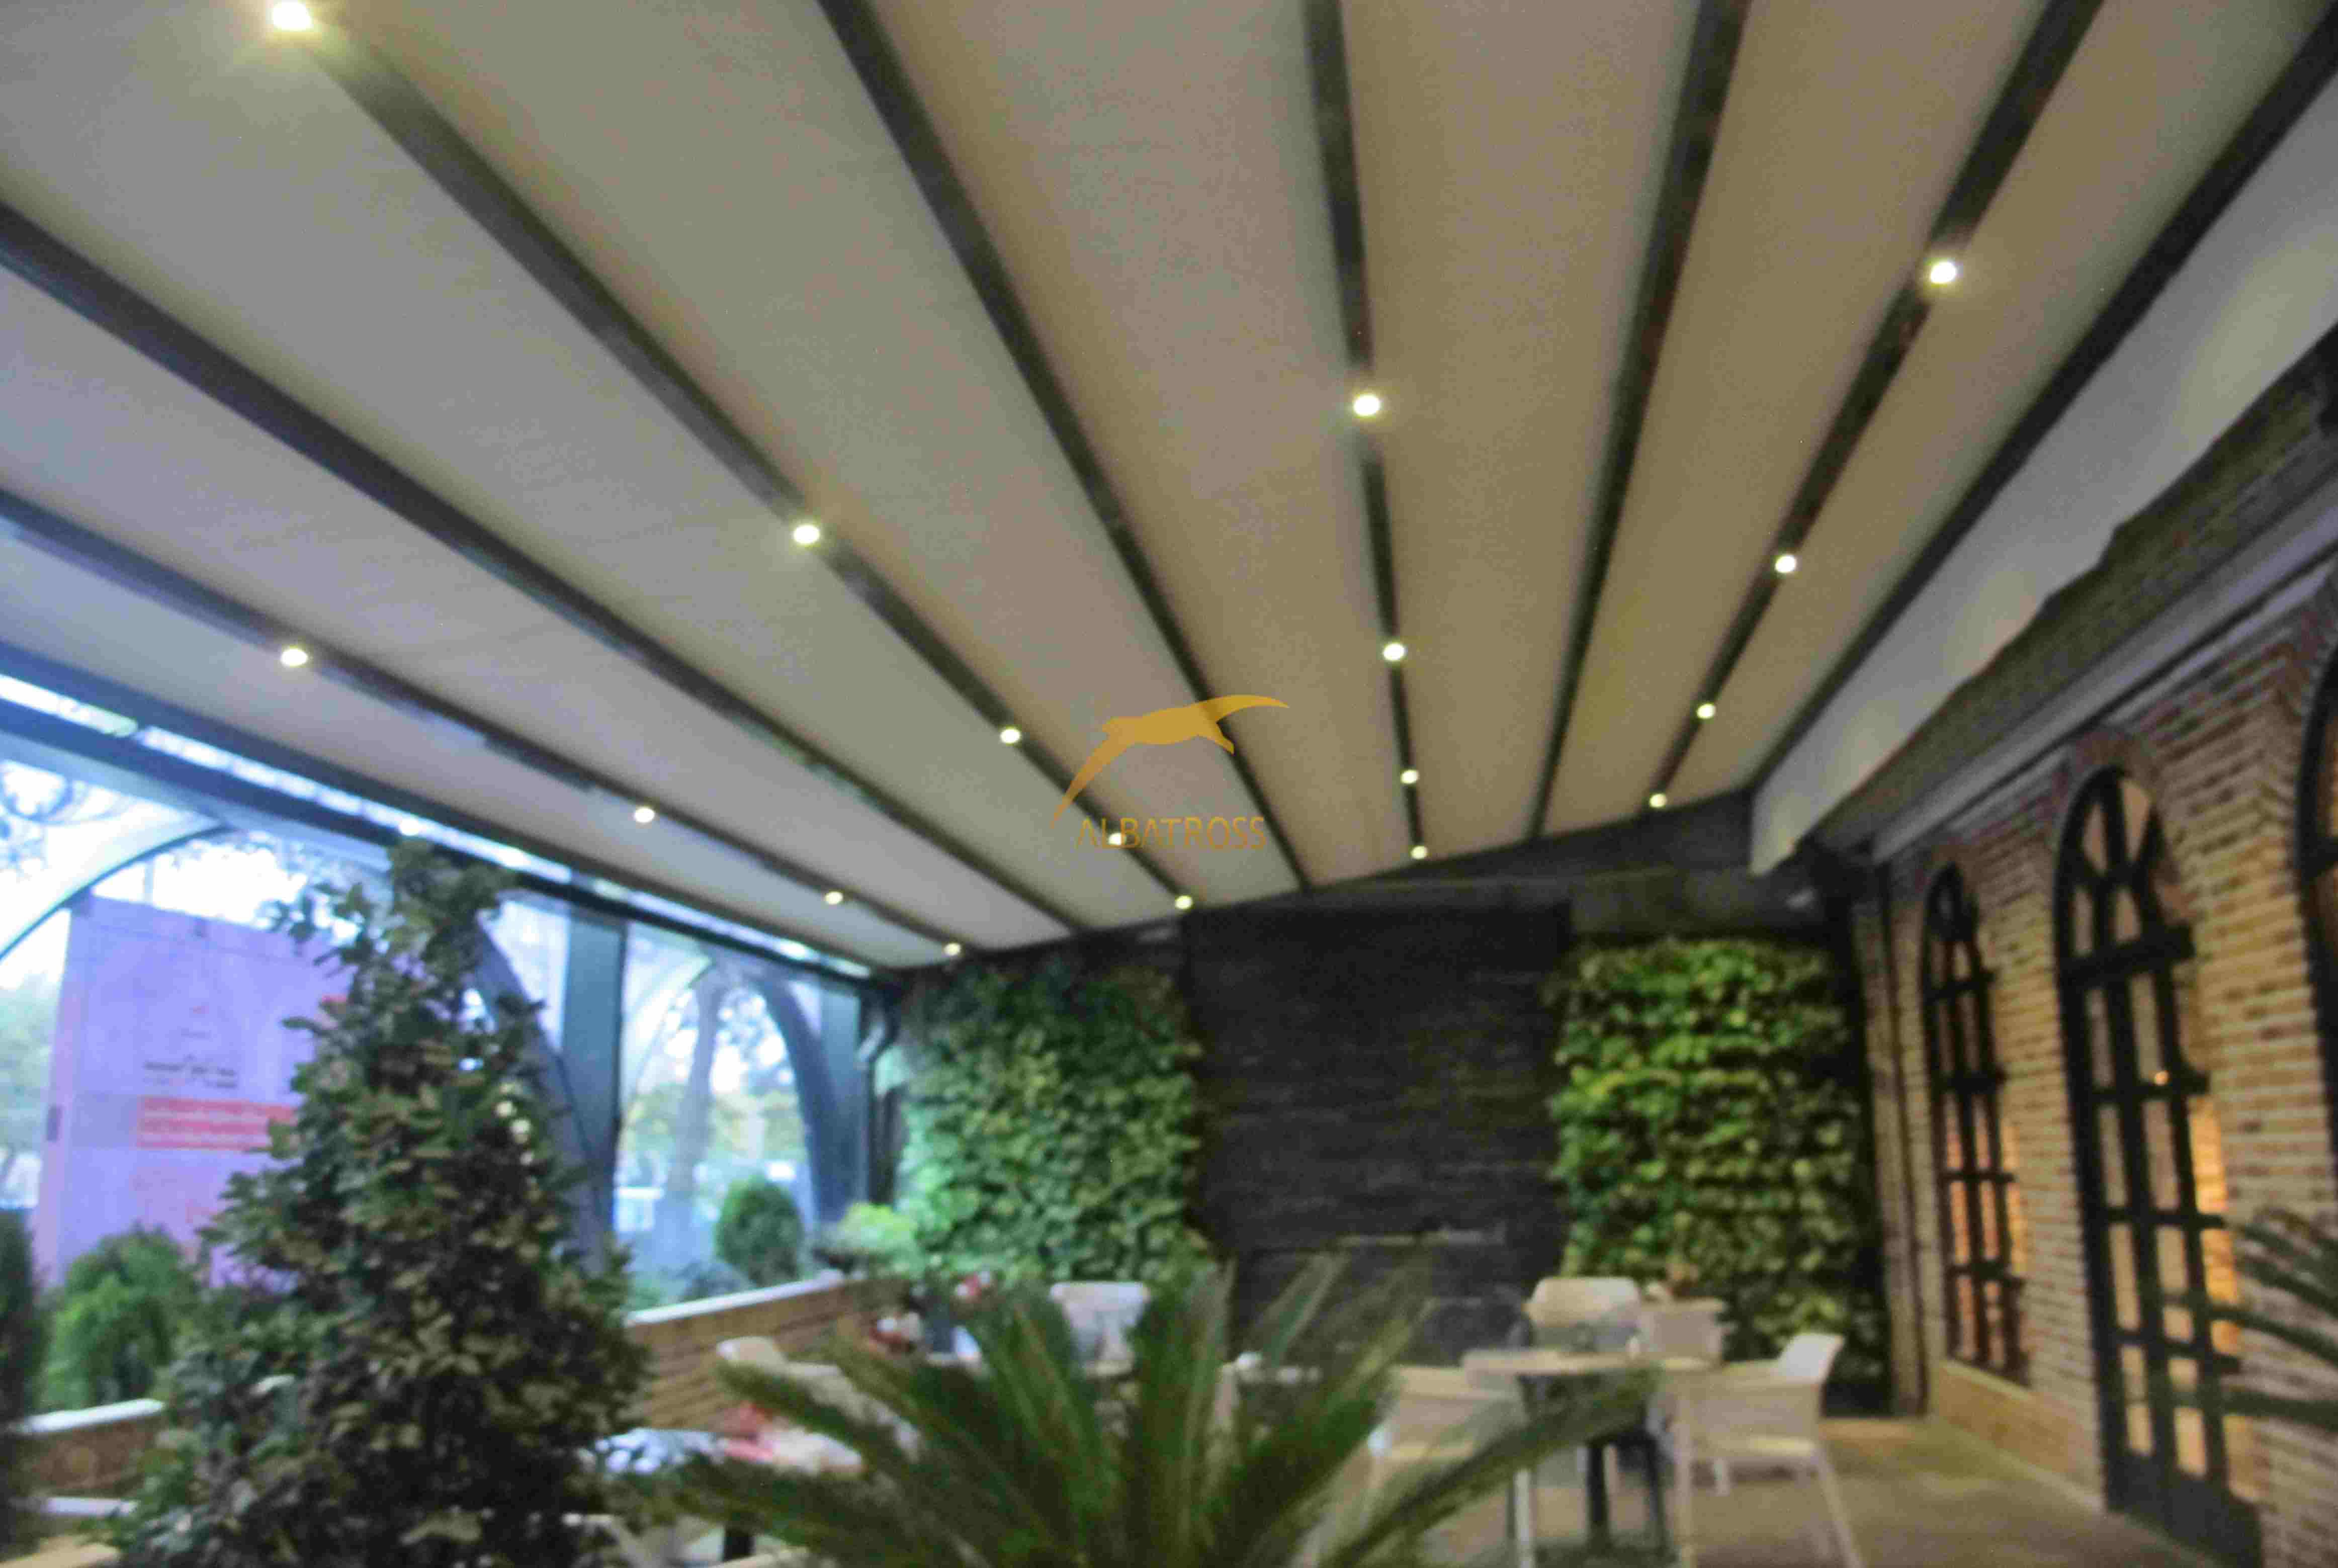 پروژه سقف متحرک کافه رستوران سیمفونی